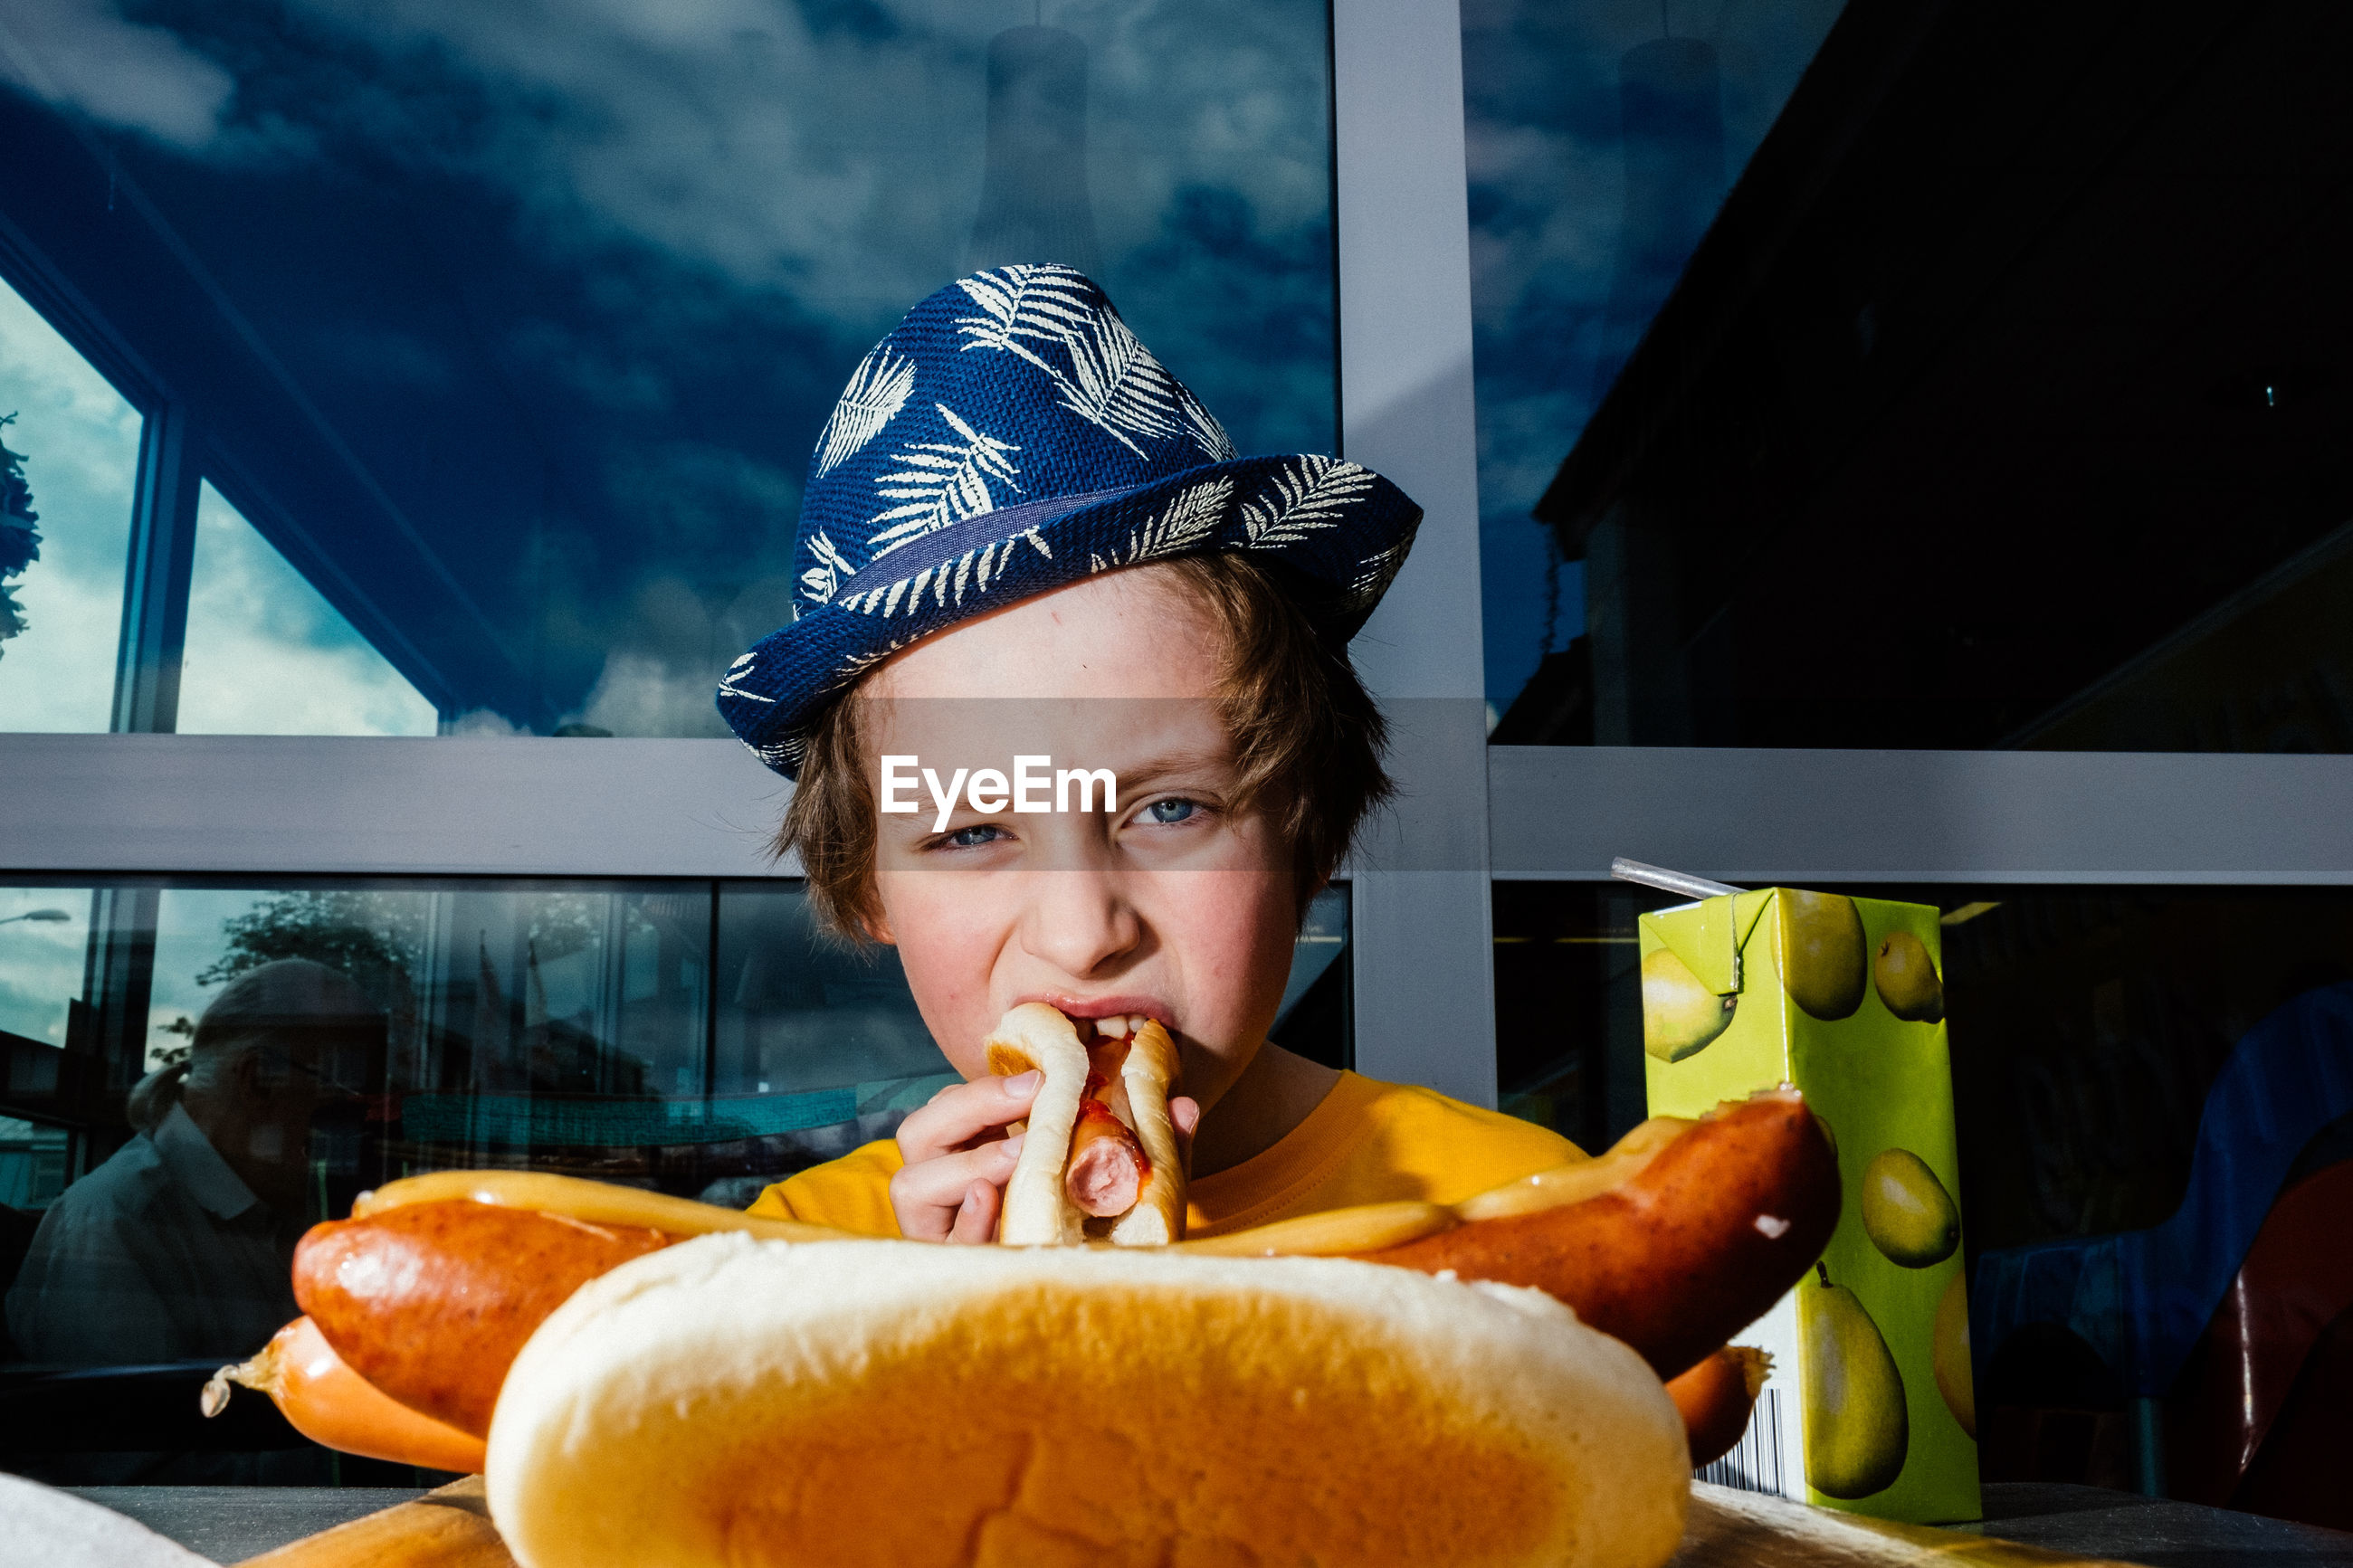 Portrait of boy eating hot dog